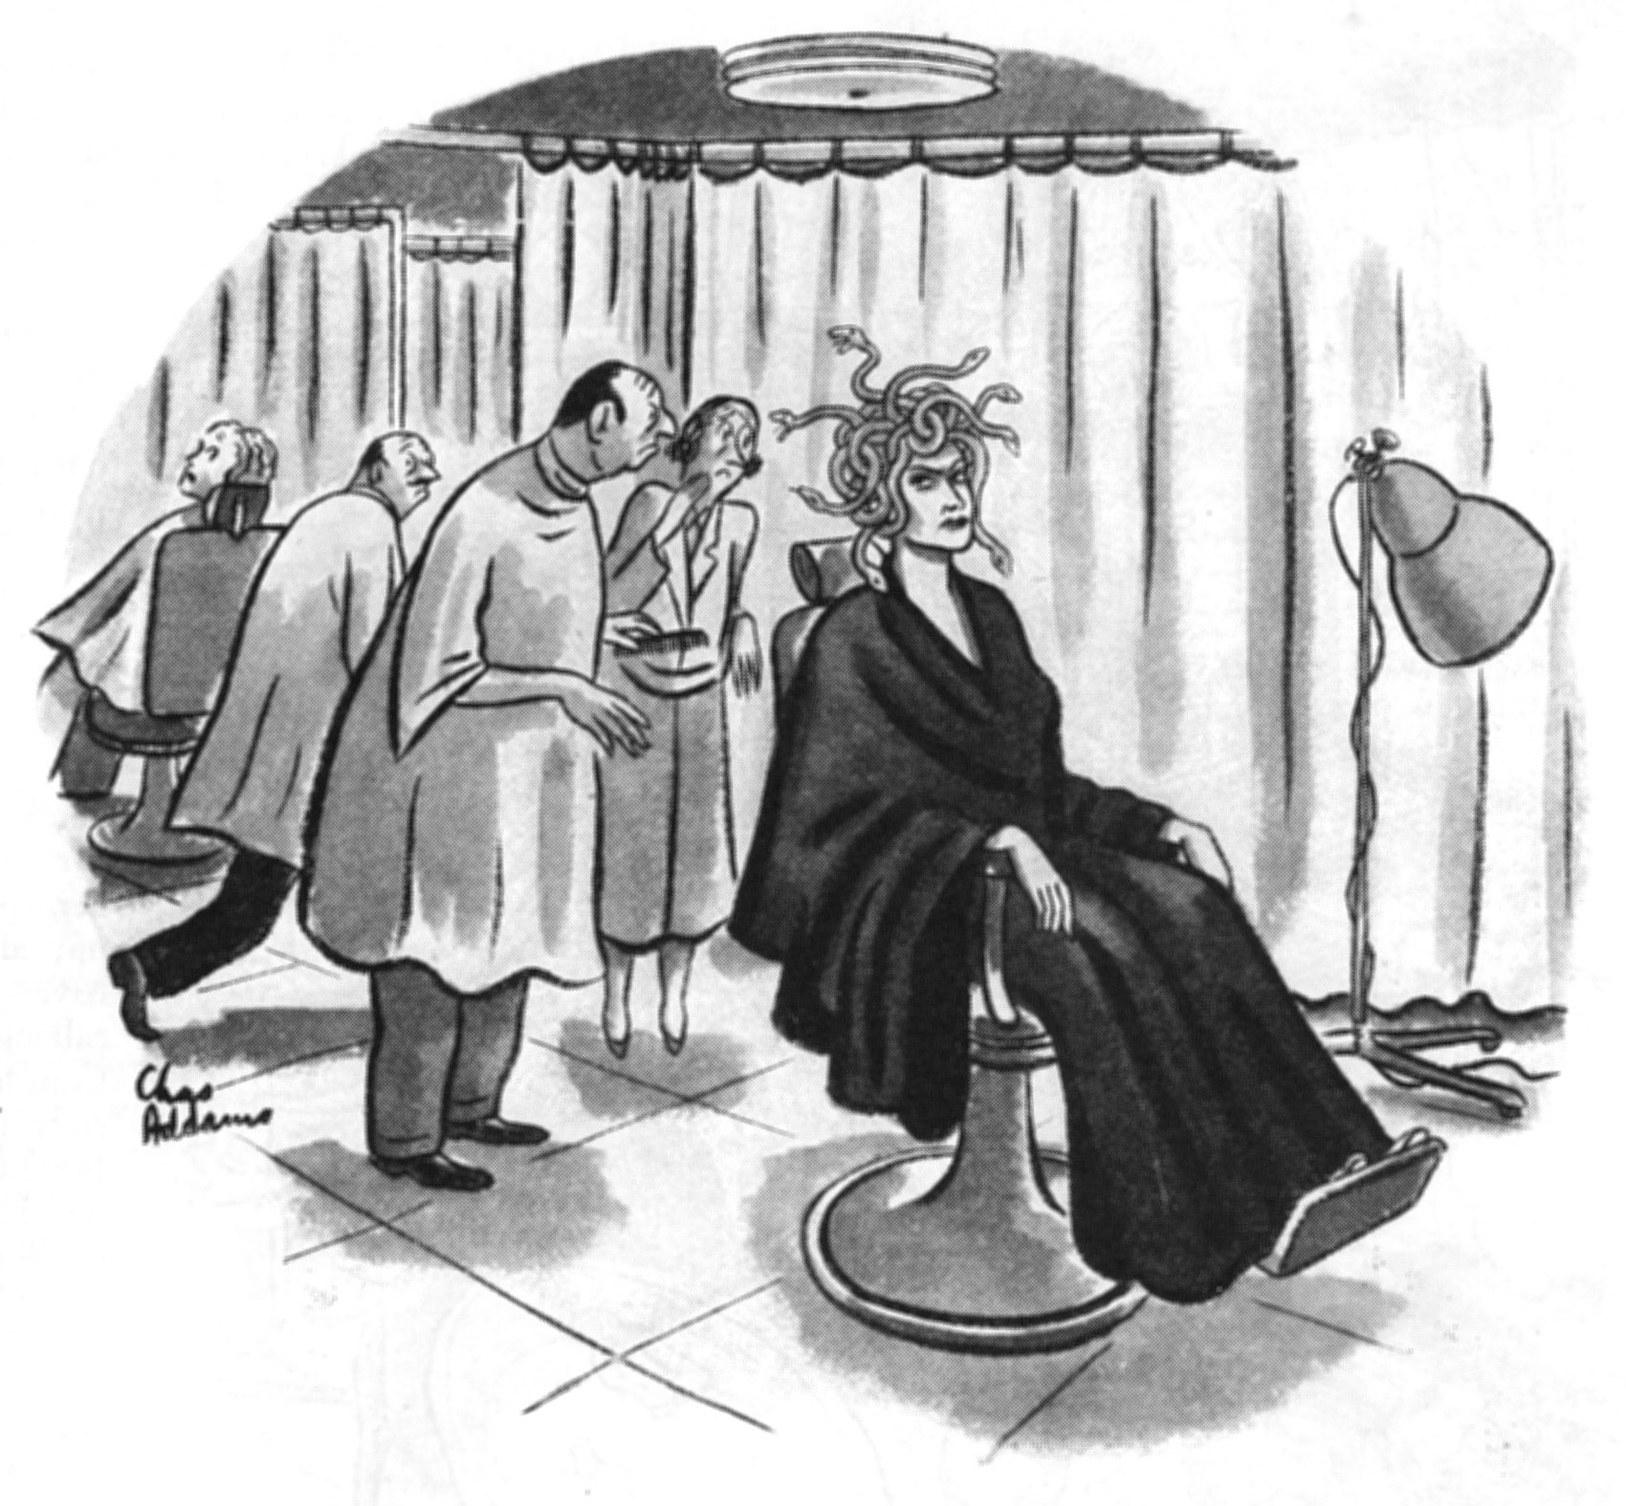 Mankoff-Charles-Addams.jpg